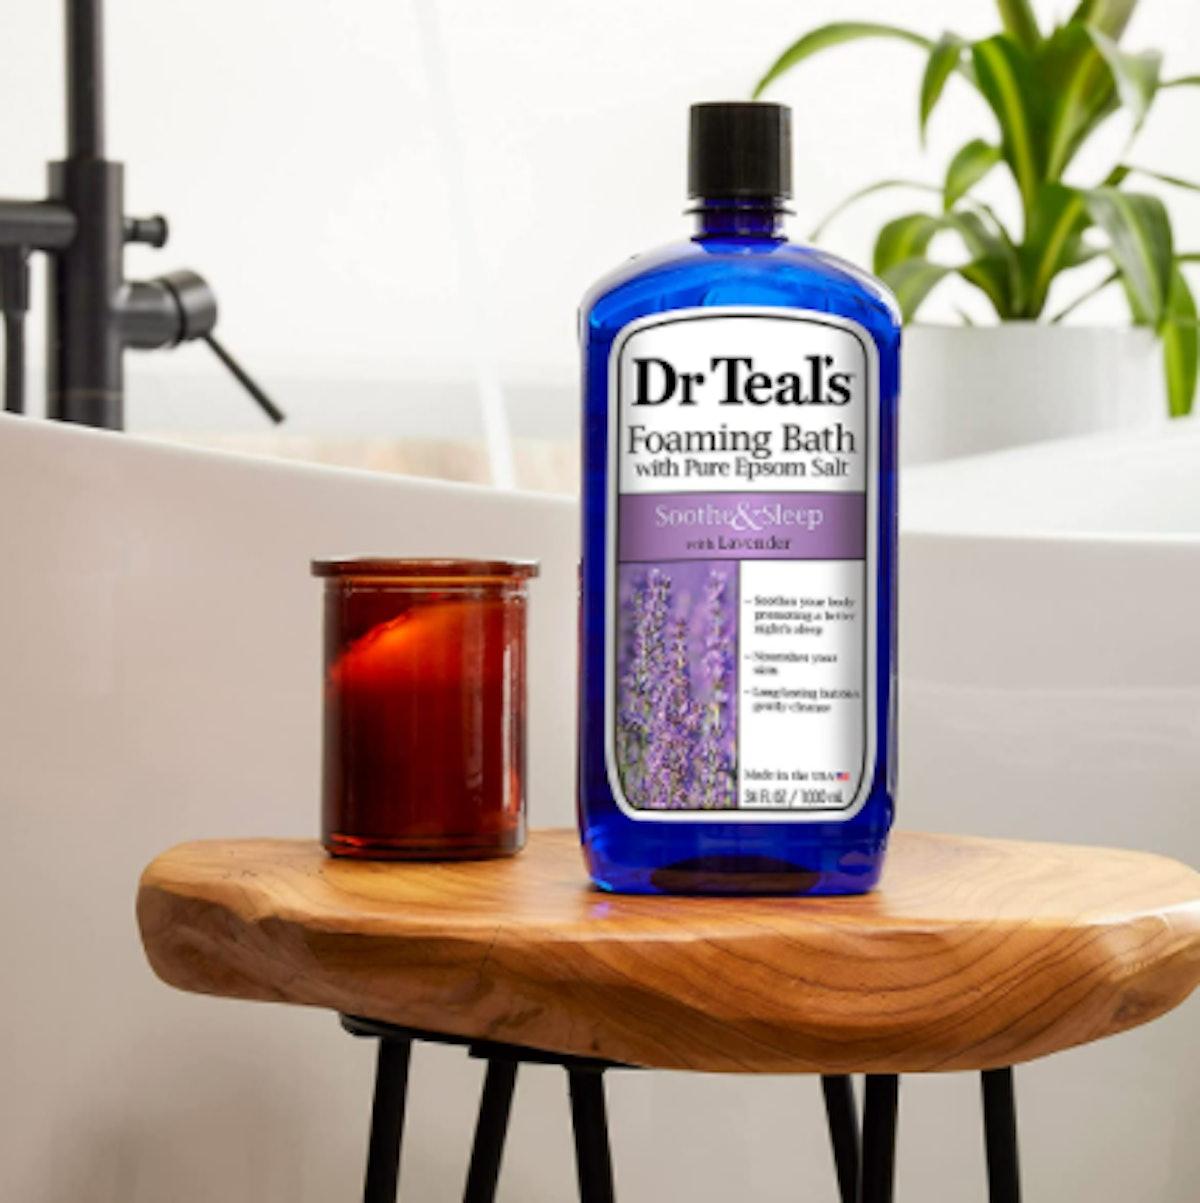 Dr Teal's Foaming Bath with Epsom Salt